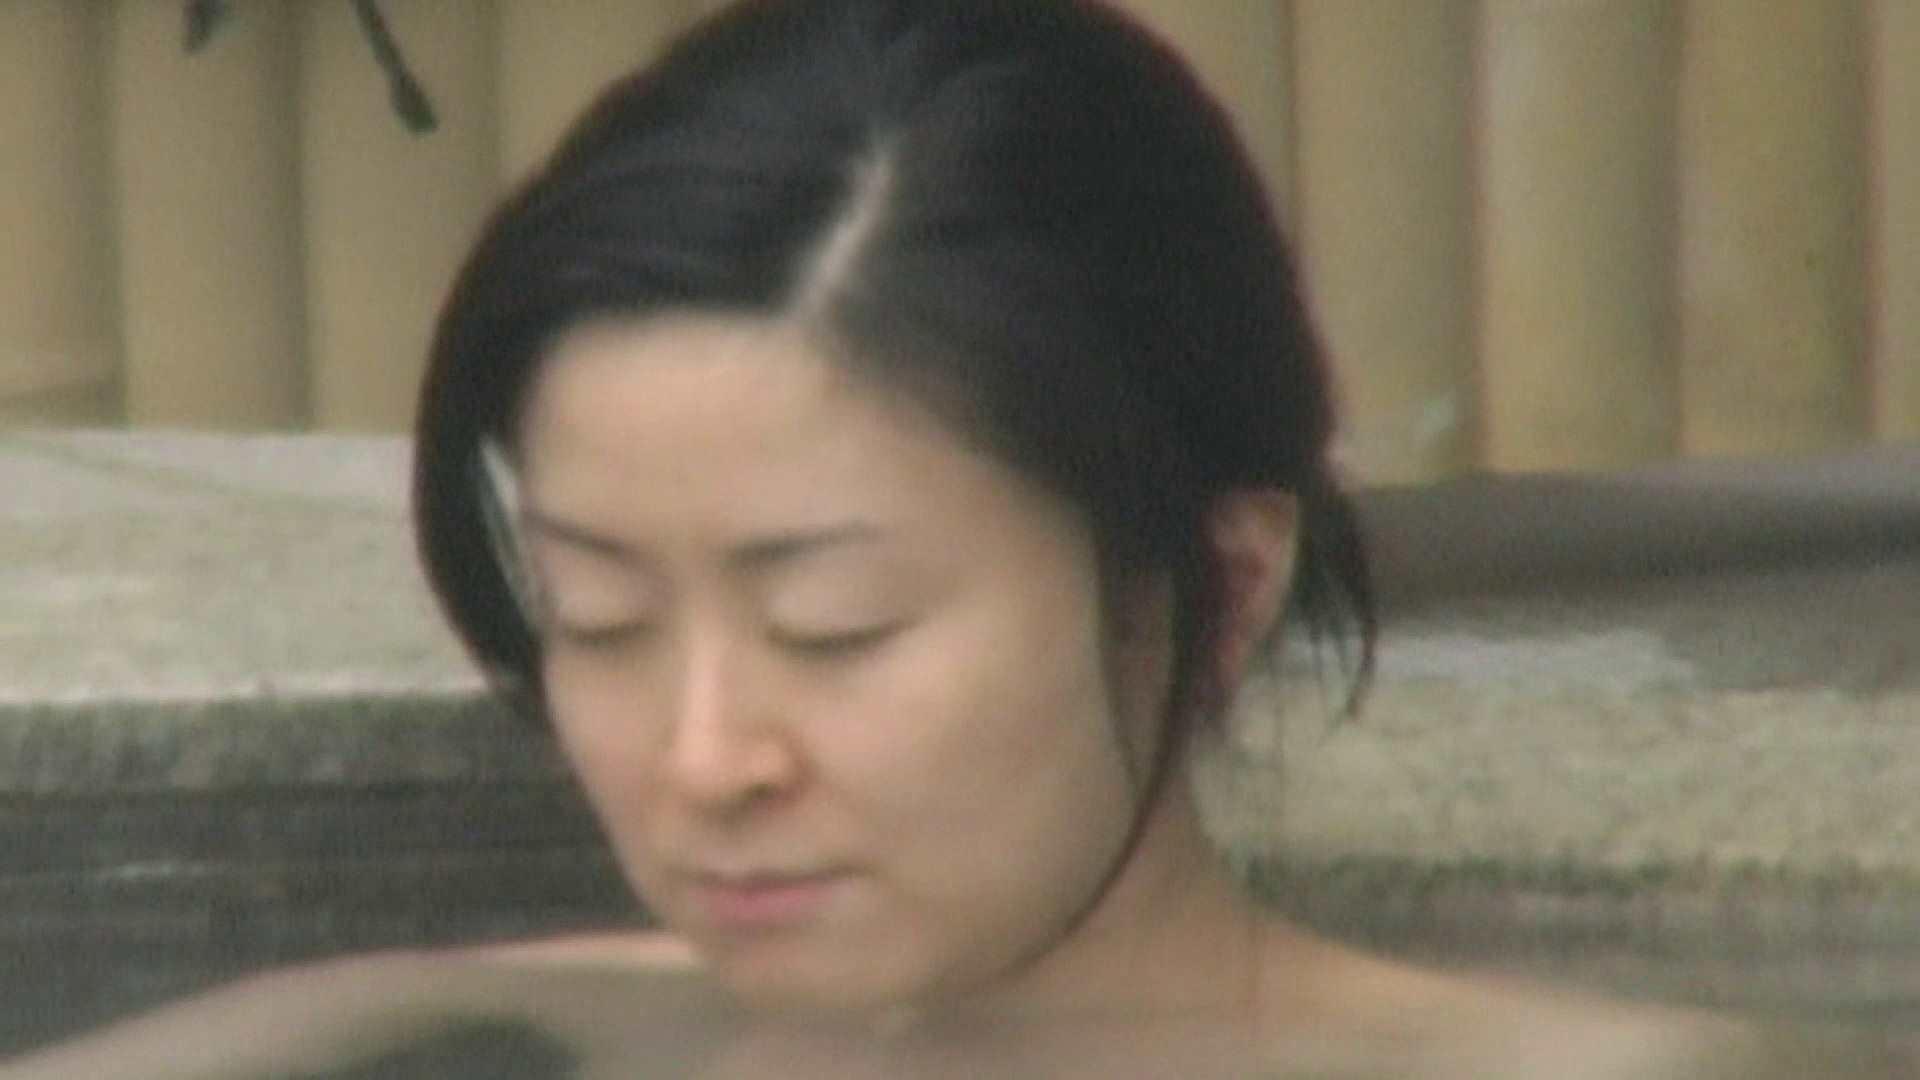 Aquaな露天風呂Vol.548 盗撮  97連発 40